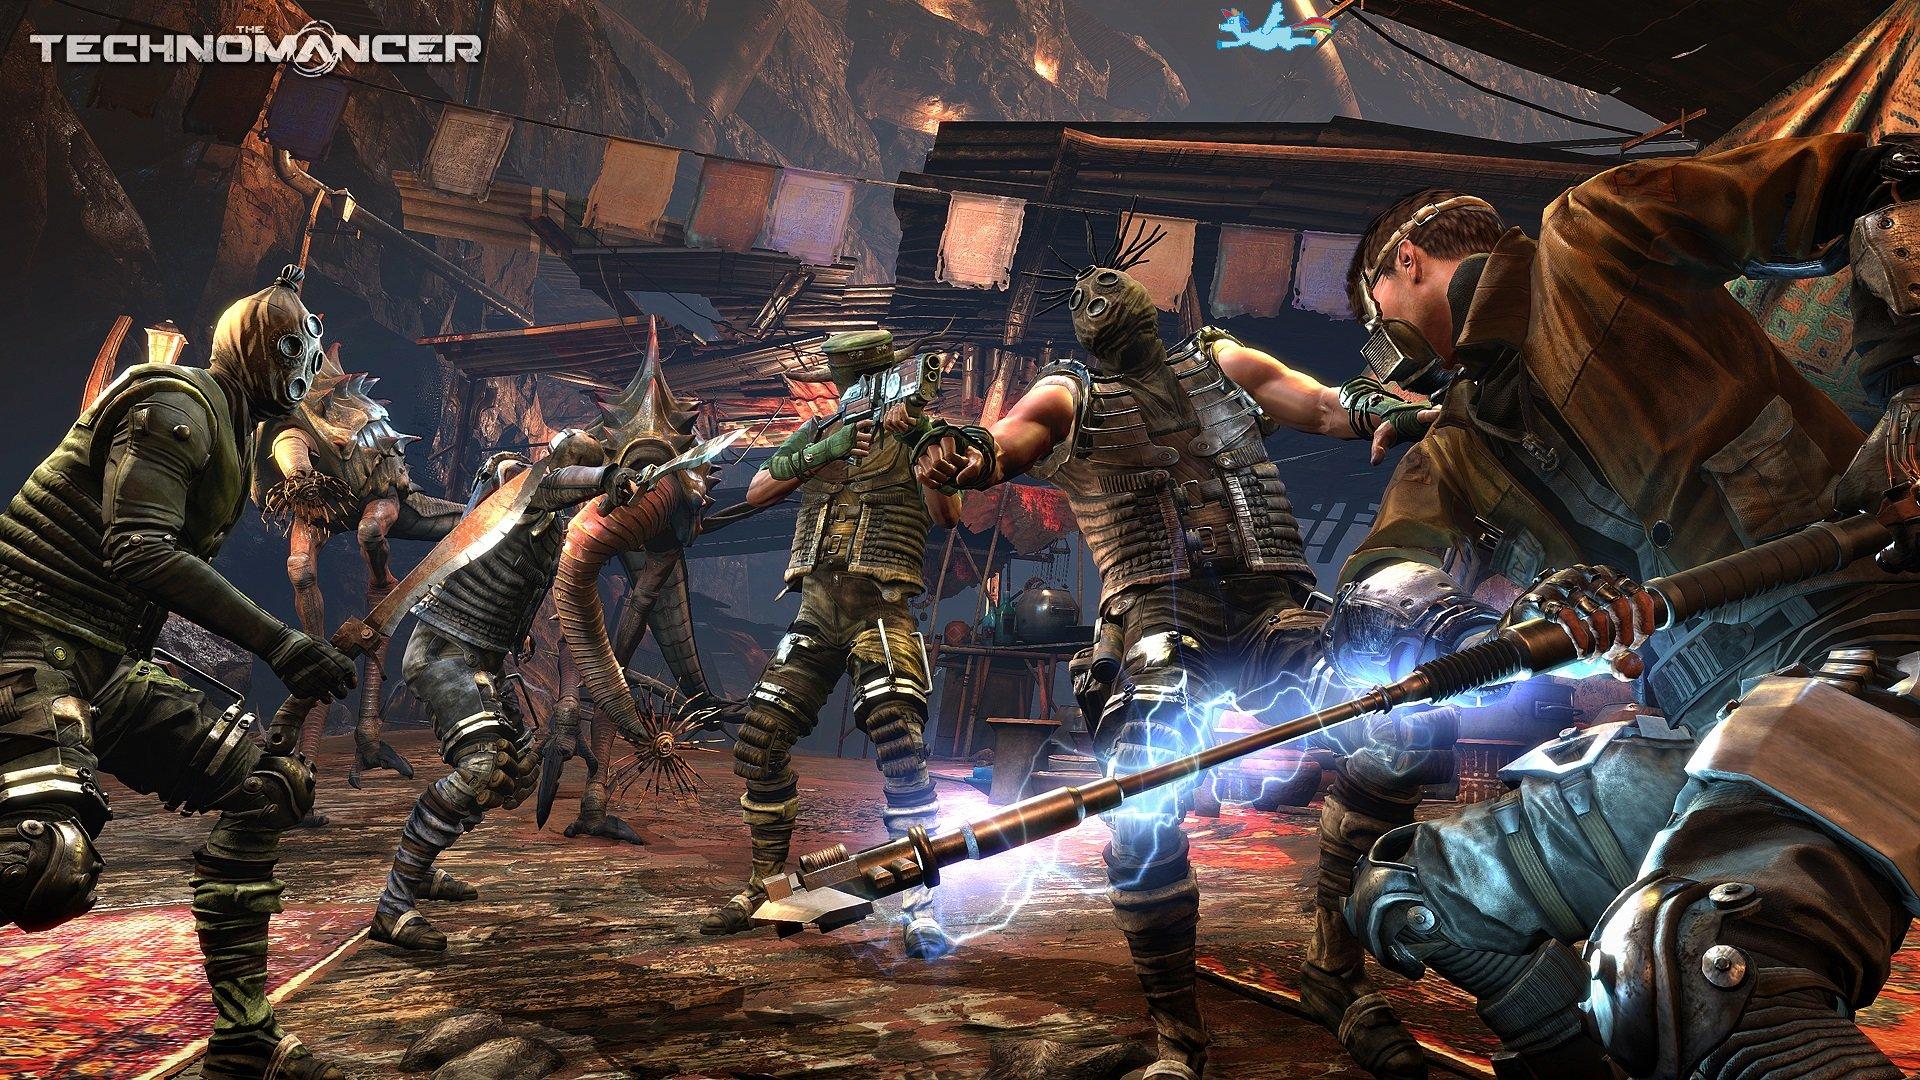 The Technomancer Screenshots ~ PS4, Xbox One & PC. - Изображение 3